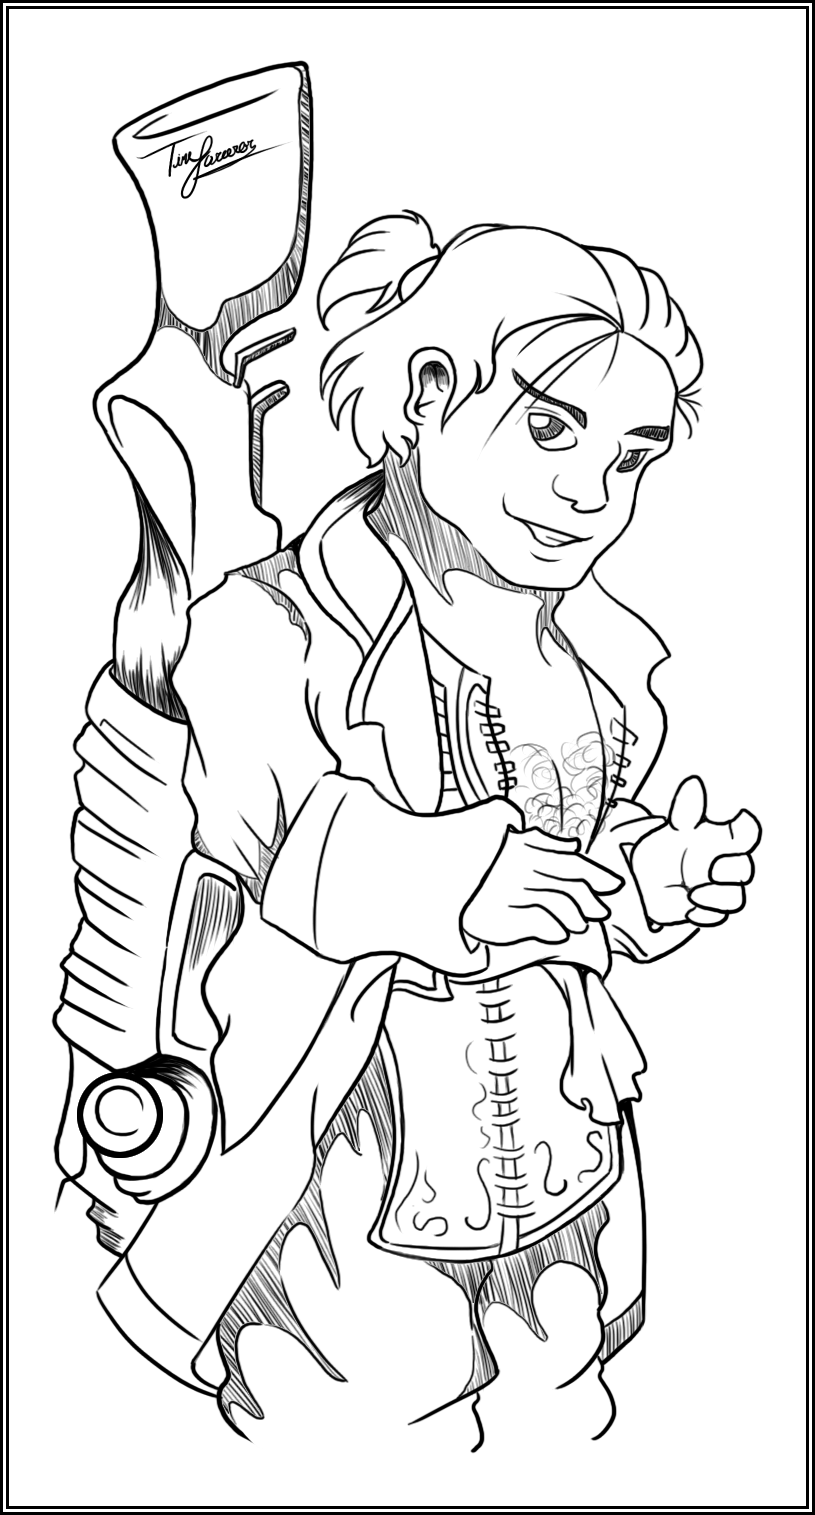 Day 11: Favorite Dwarf in DA:O, DA2, or DA:I (Varric Tethras)